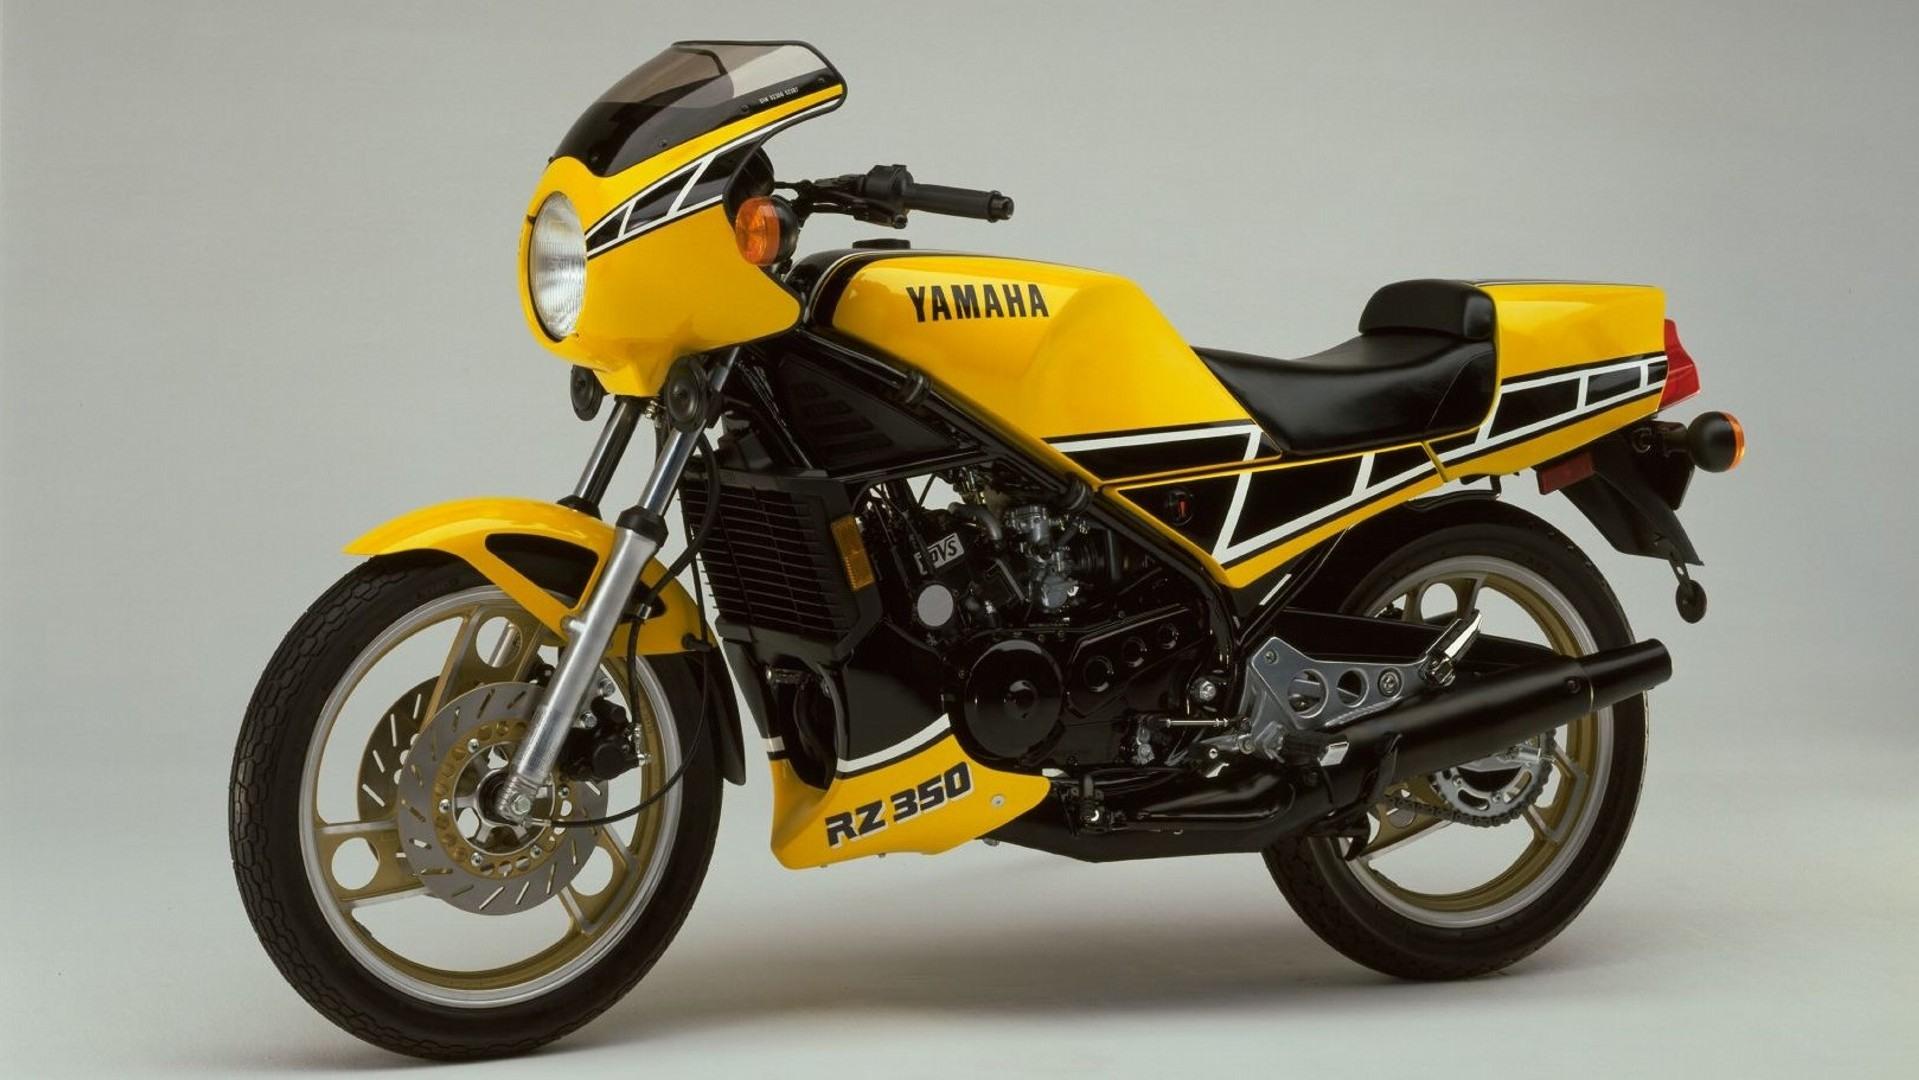 Yamha RZ 350 Kenny Roberts Edition (9)